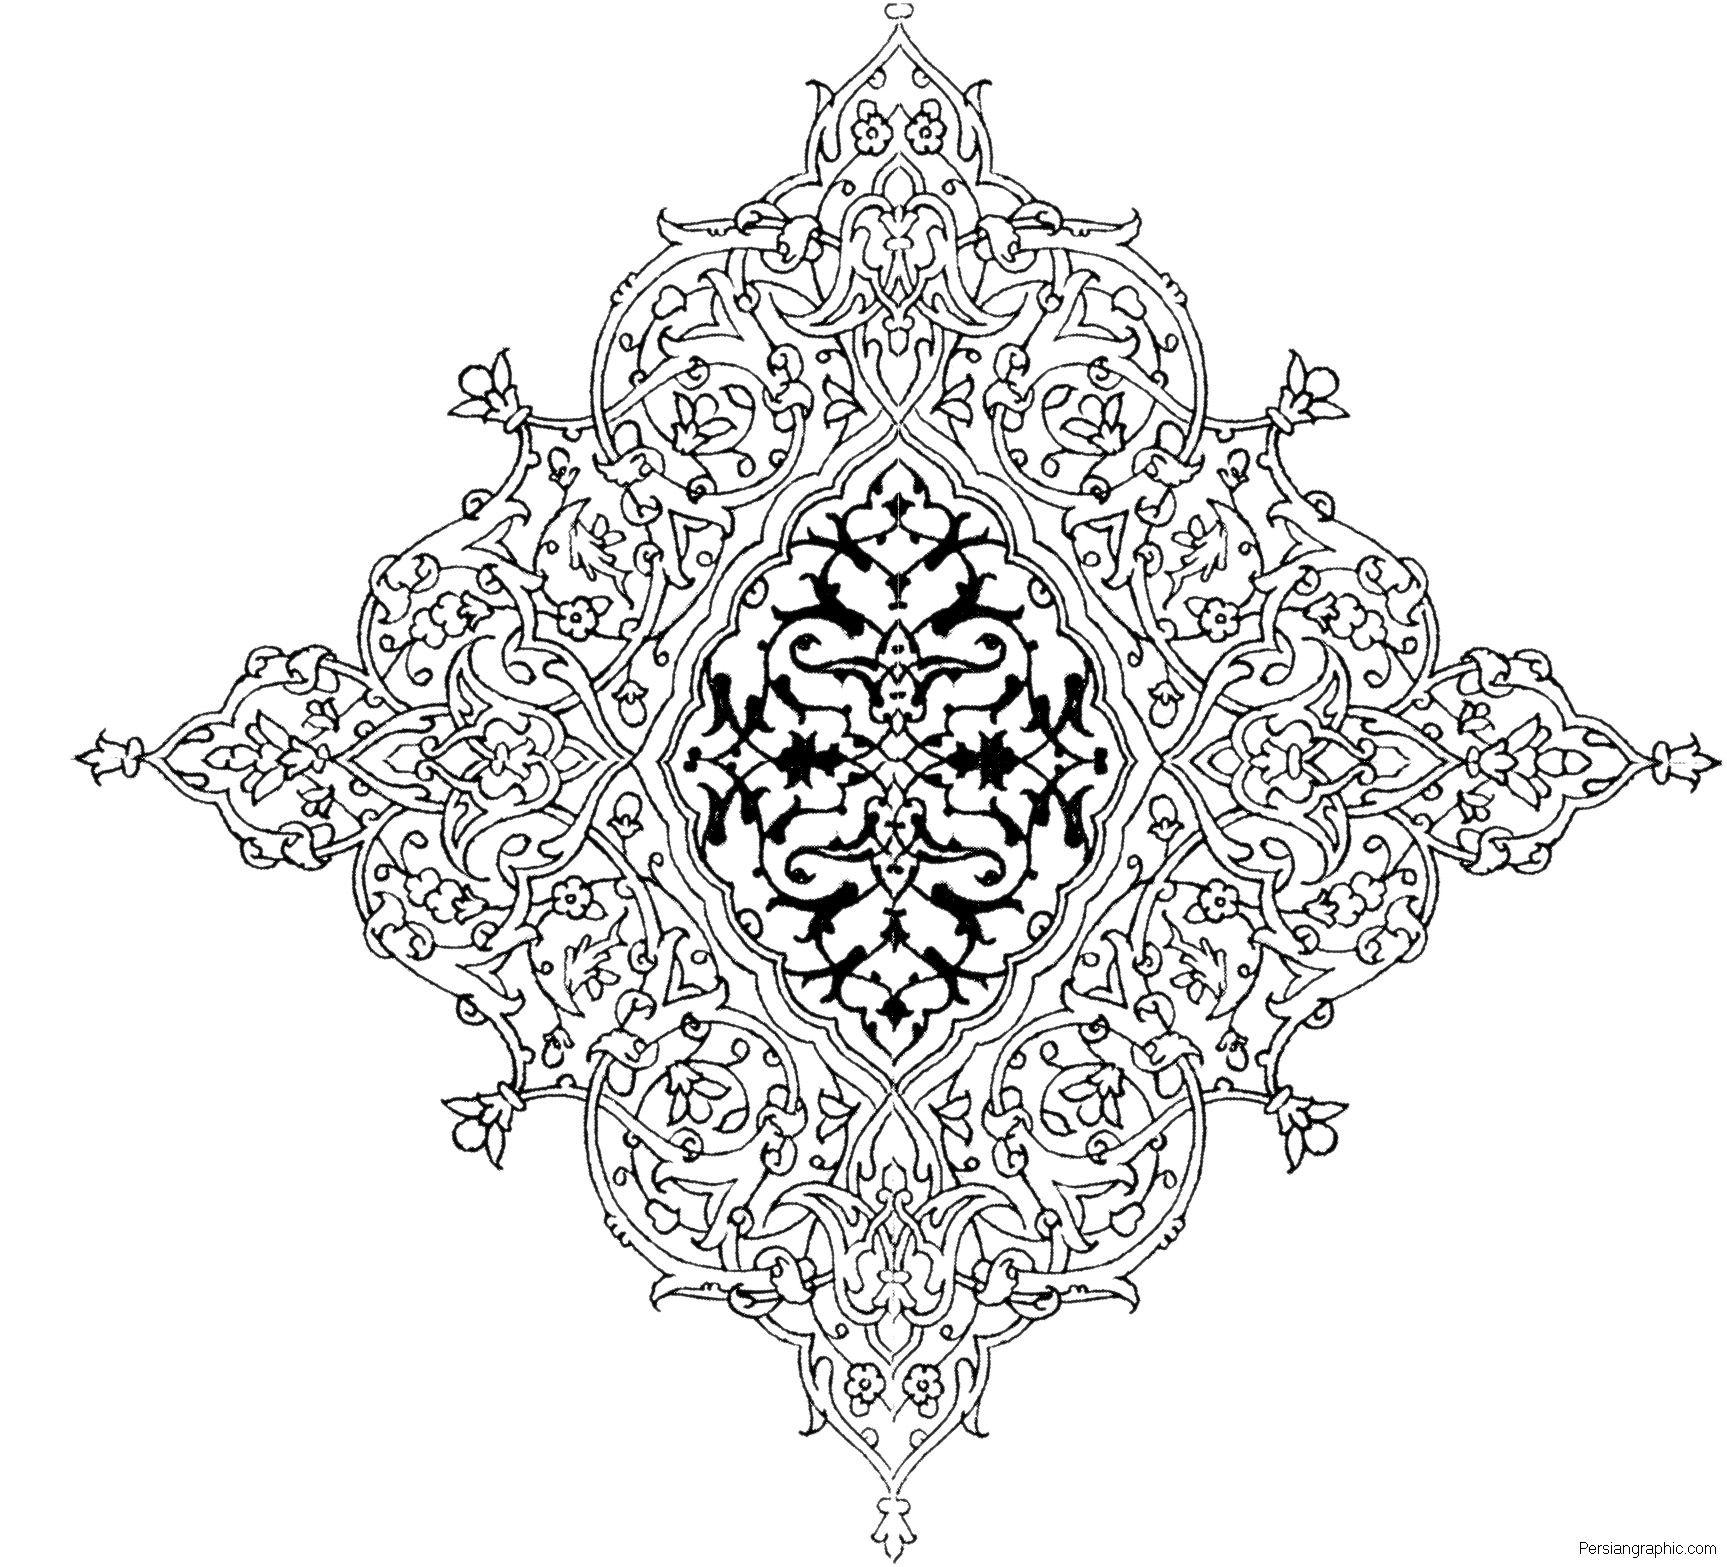 Eslimi 25 20091020 1129884660 1727x1567 Arabesque PatternIslamic PatternsIslamic MotifsAdult ColoringColoring BooksColouringIslamic